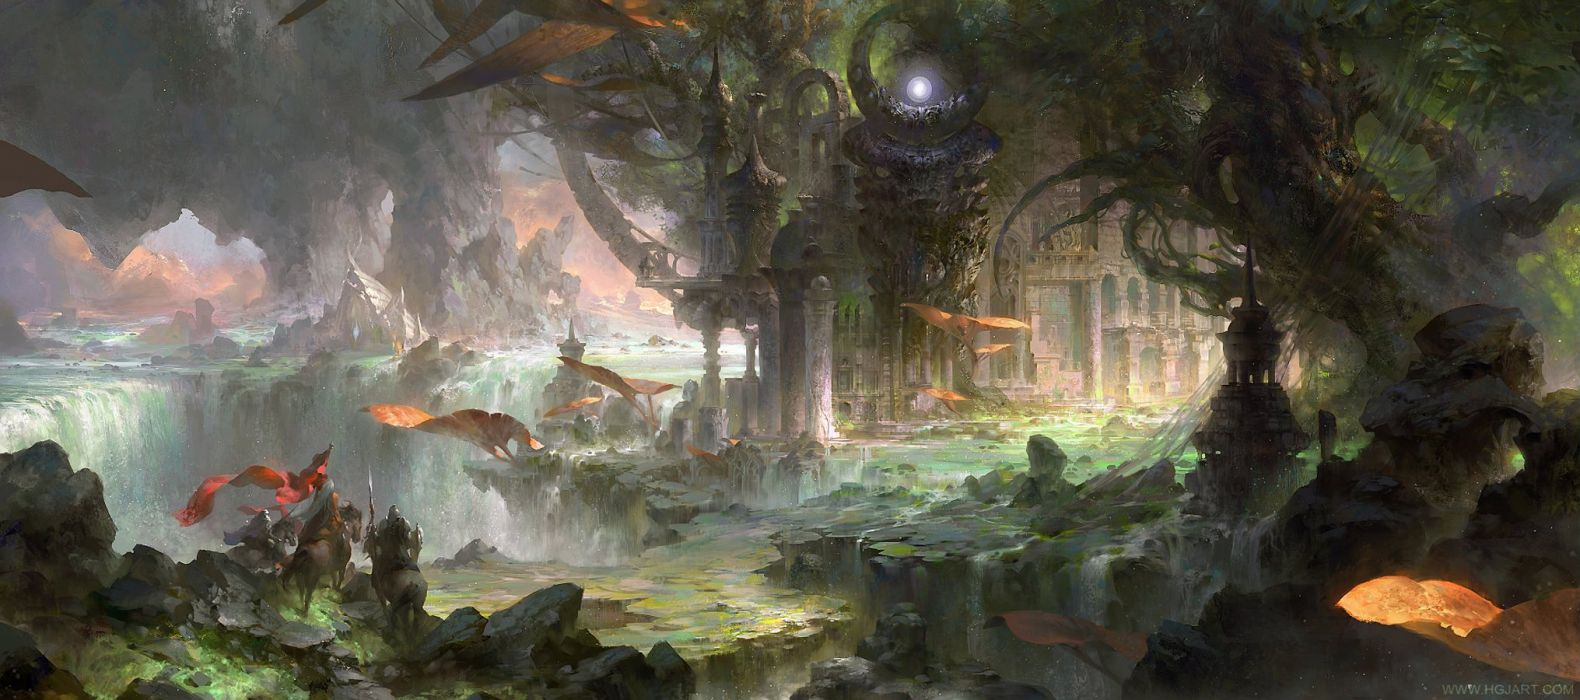 beautiful artstation original fantasy guangjian-huang-the-ancient-city wallpaper